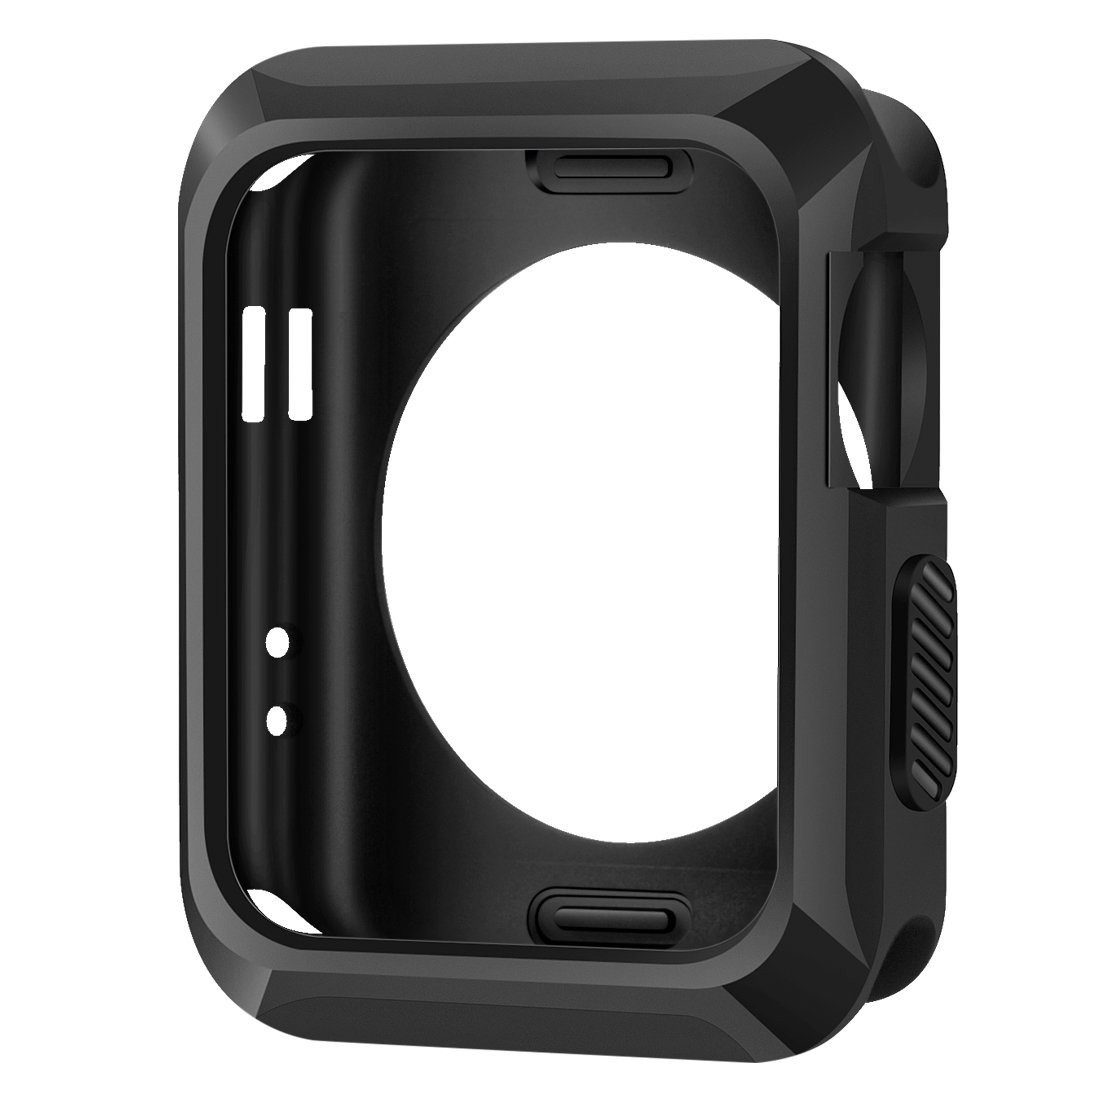 Apple Watch Case, iitee 38mm Universal Slim Rugged Protective TPU iWatch Case for Apple Watch Series 3 Series 2 Series 1 (Matte Black)